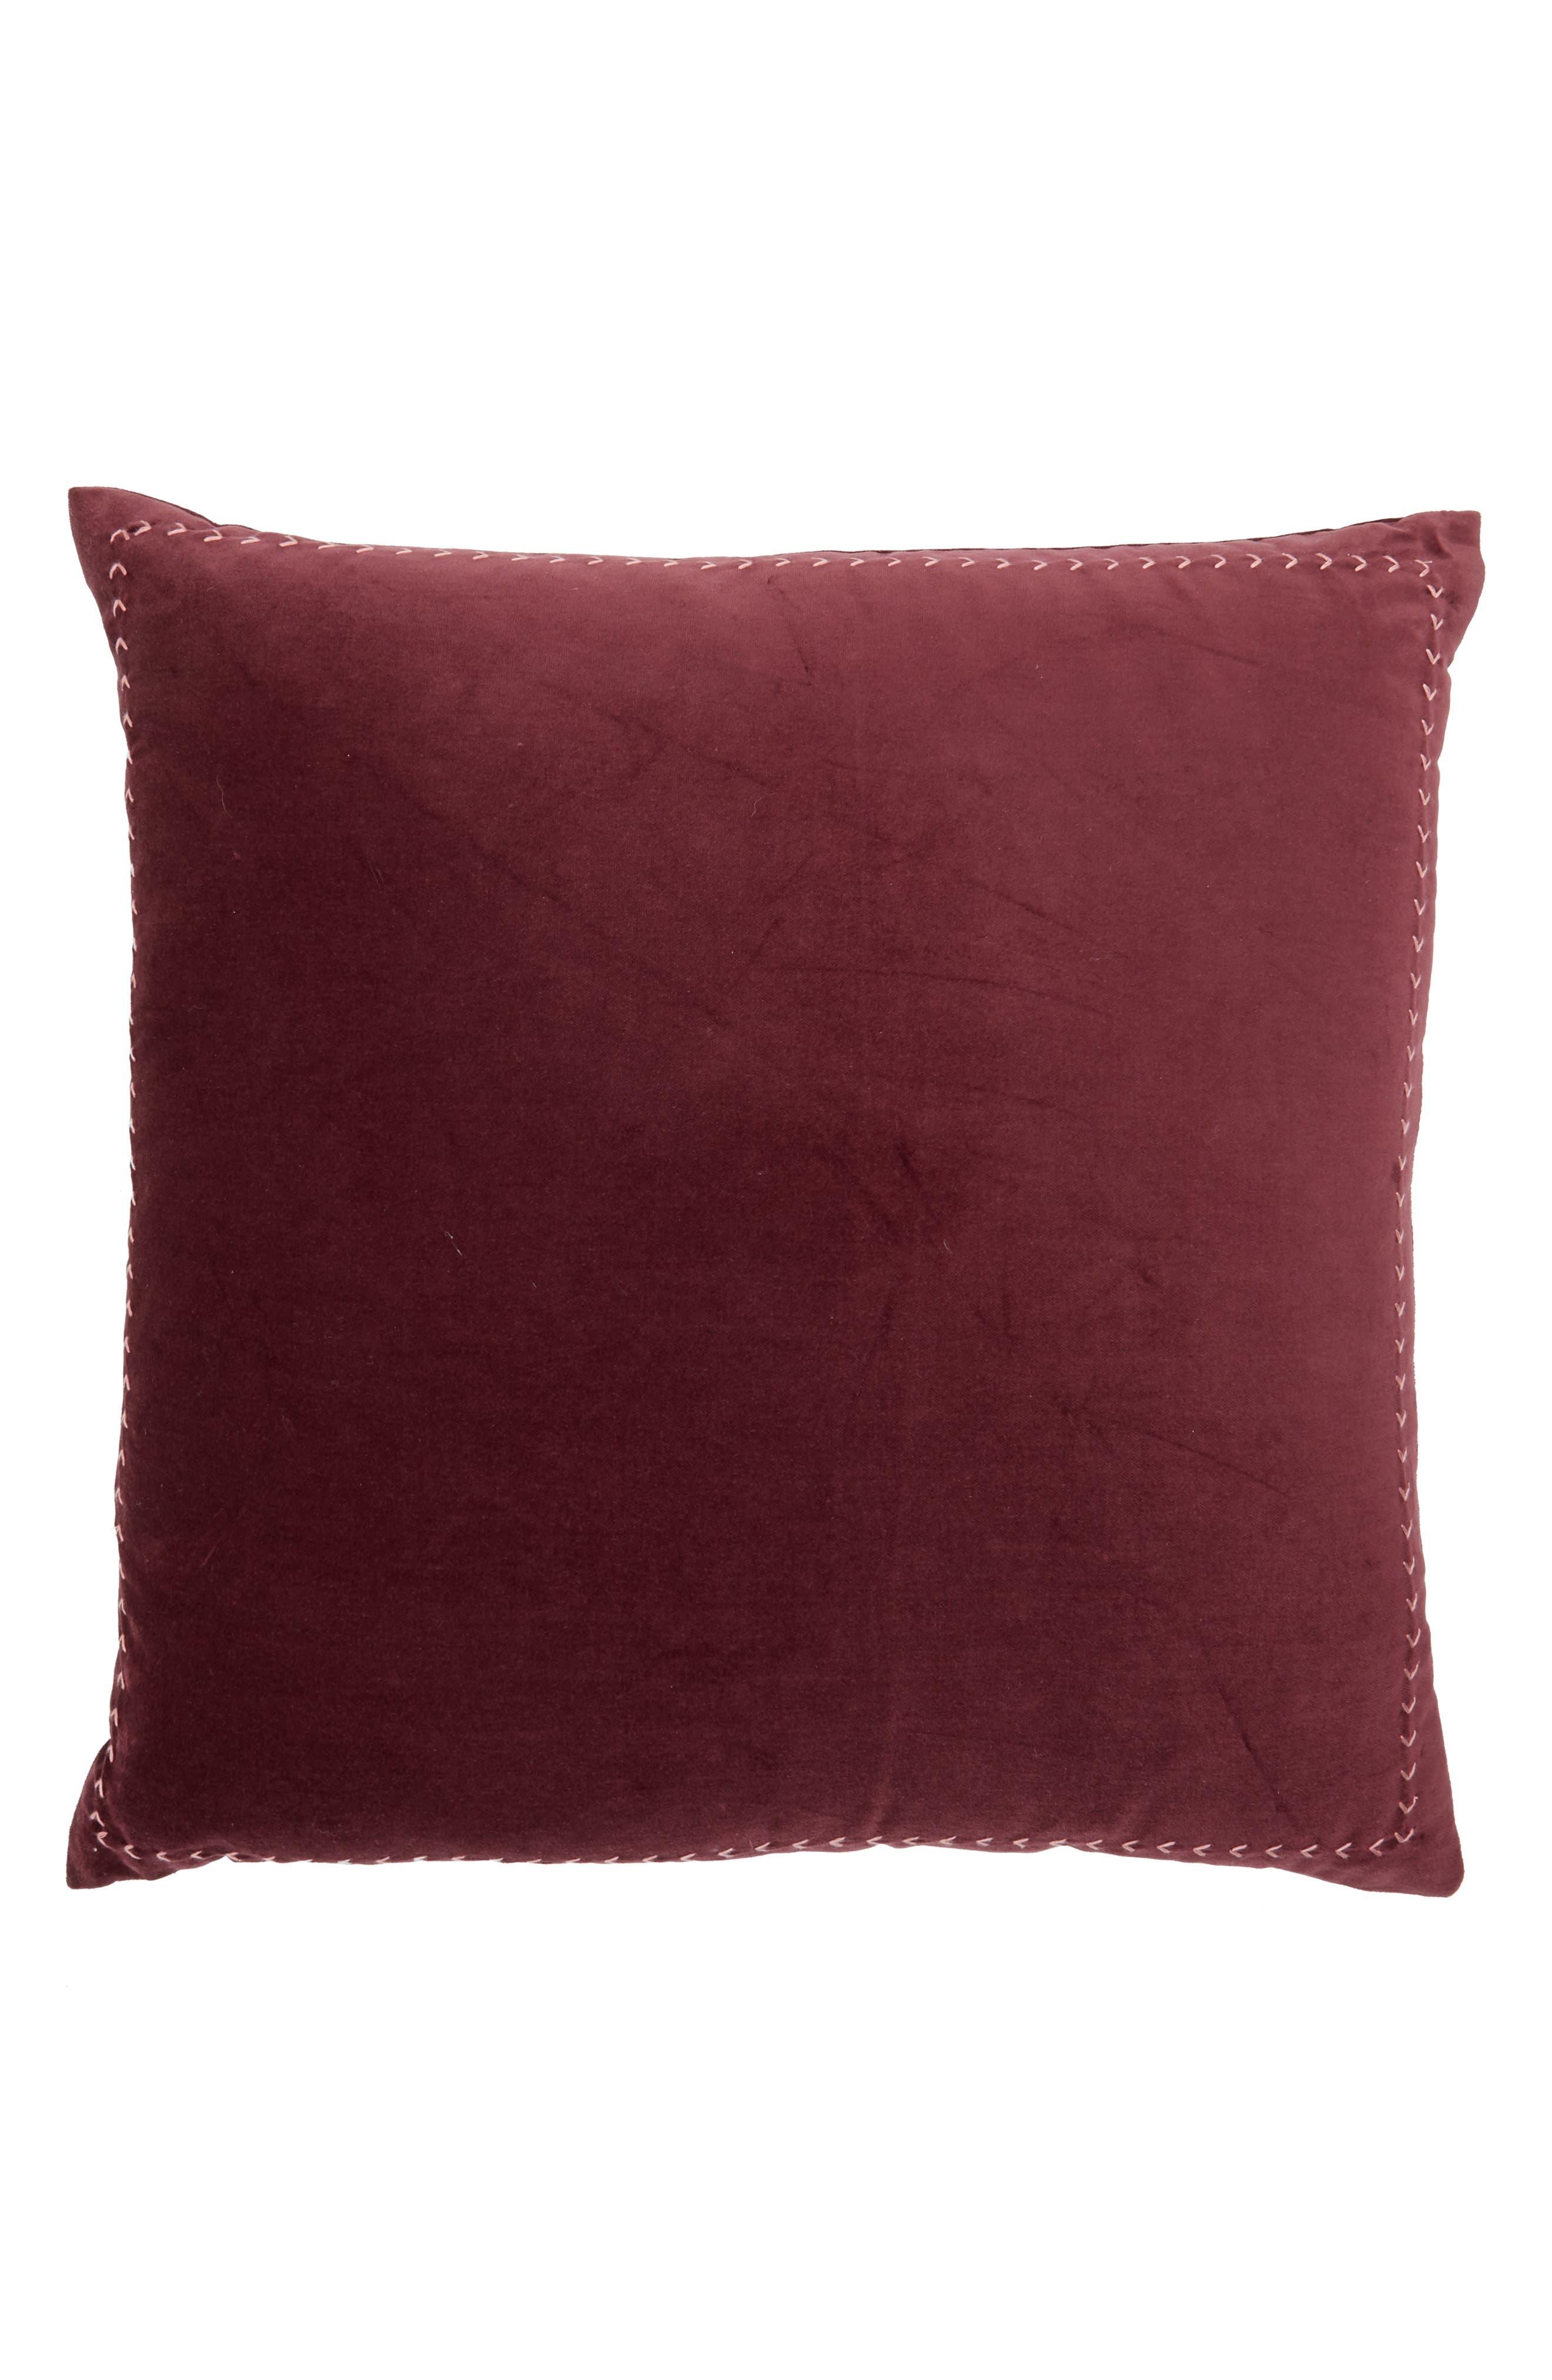 Velvet Accent Pillow,                             Main thumbnail 1, color,                             Burgundy